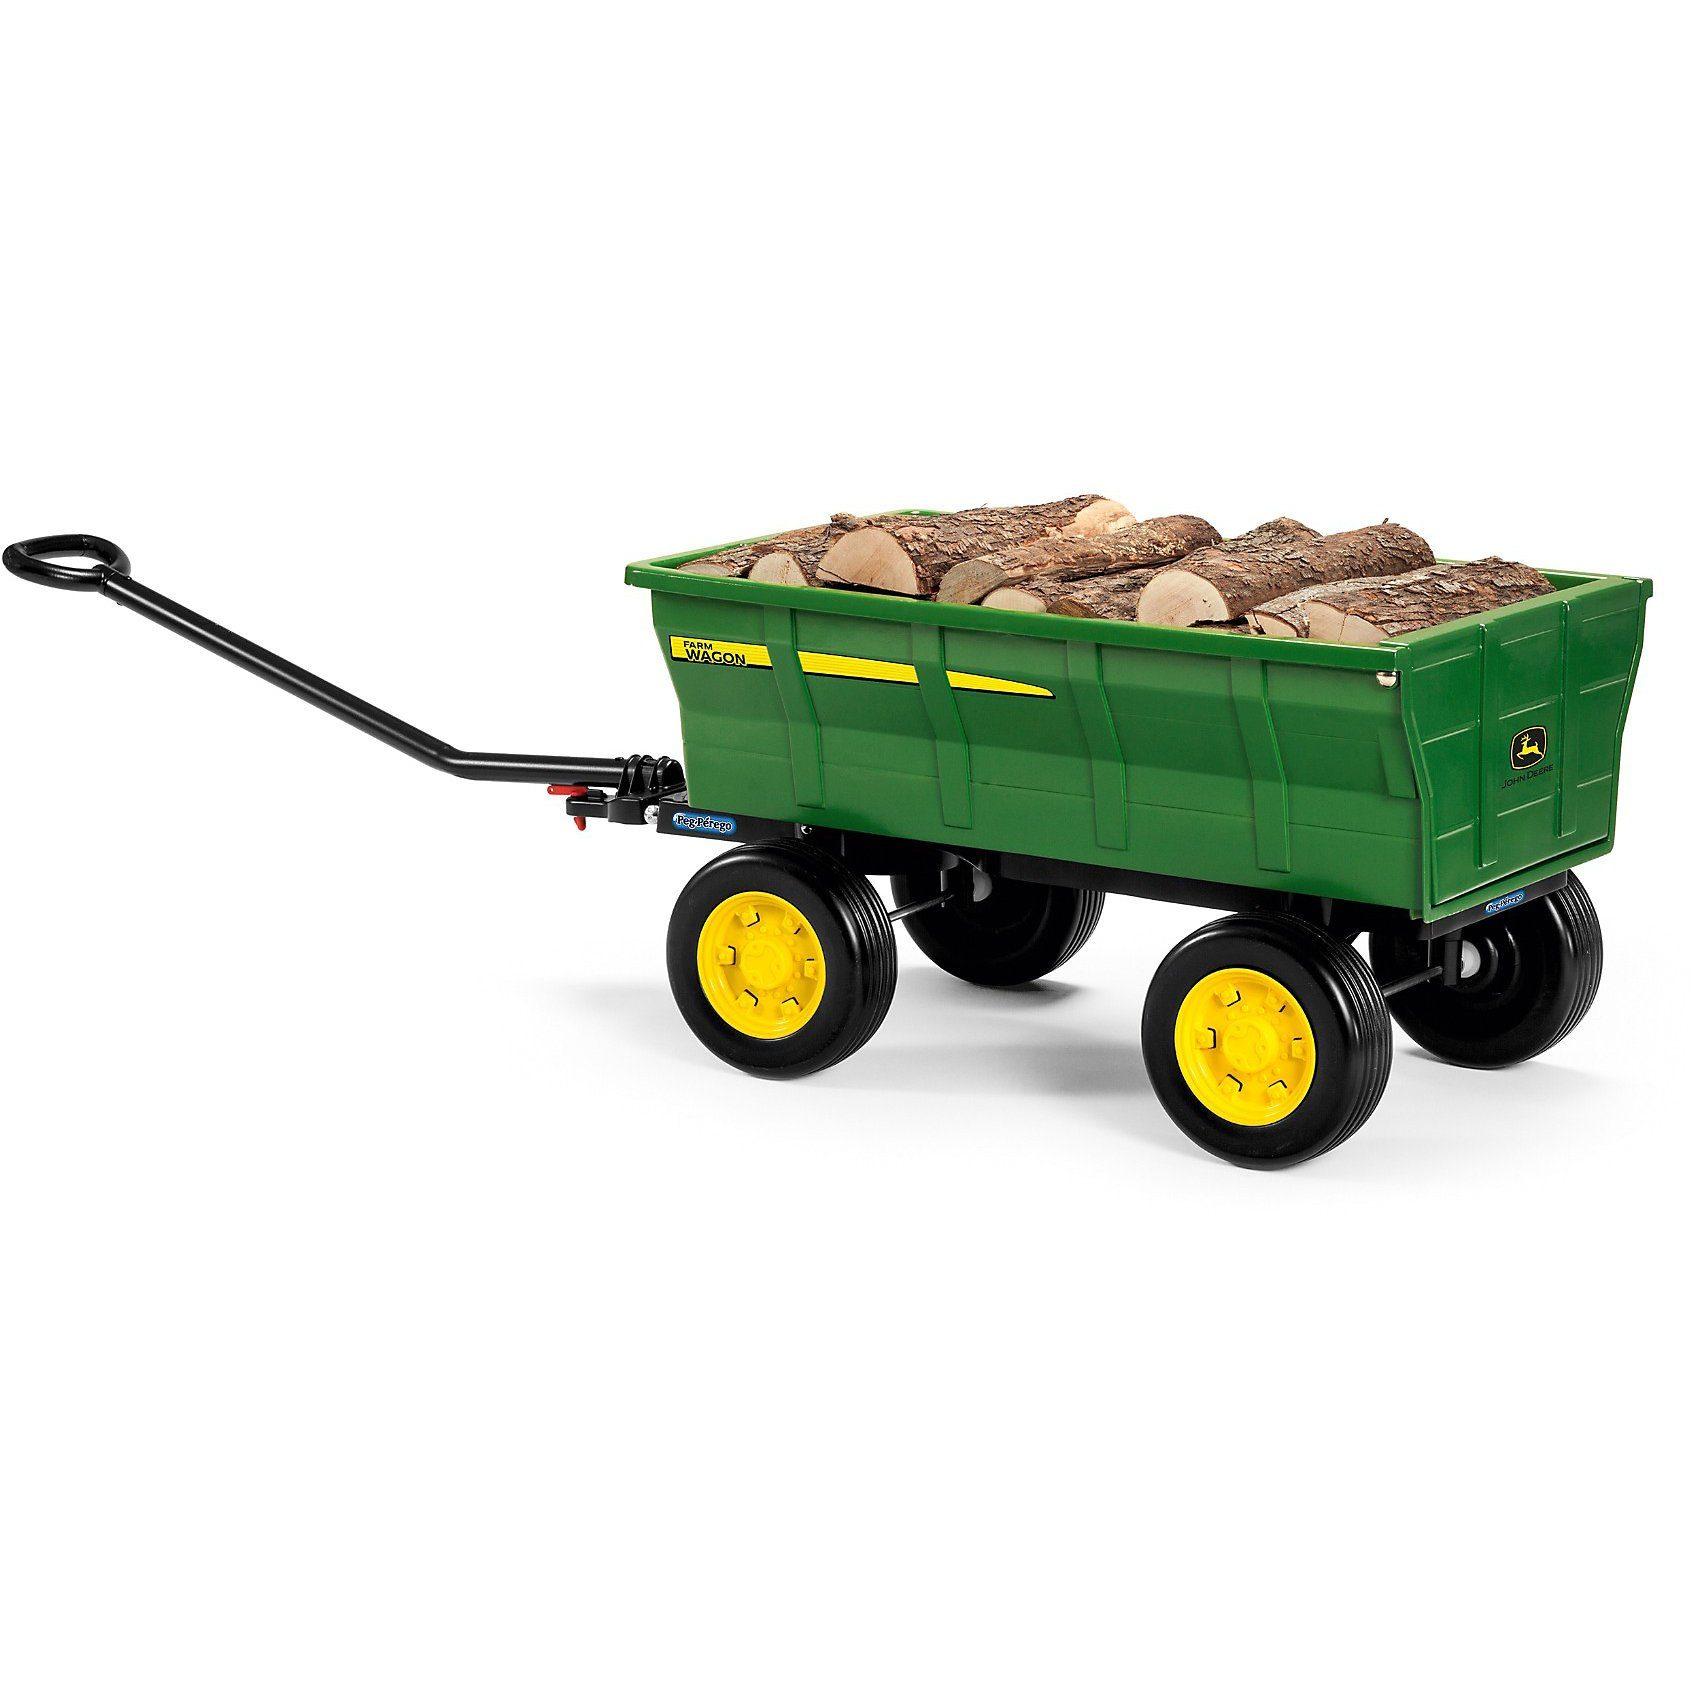 Peg Perego John Deere Anhänger/ Handwagen